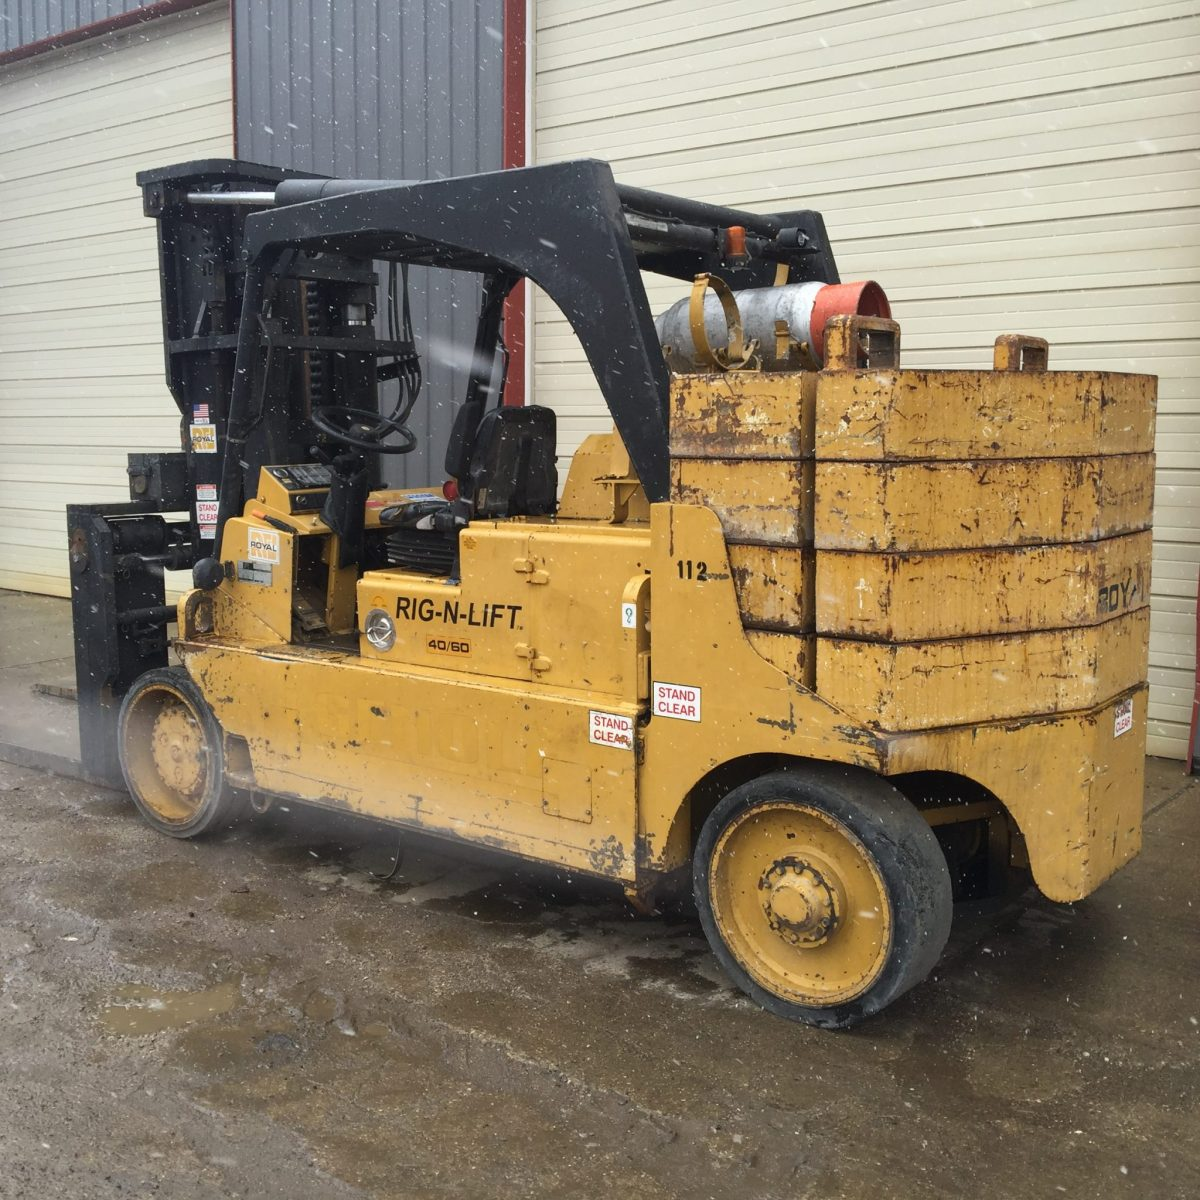 40 000lb To 60 000lb Royal Rig N Lift Forklift Like